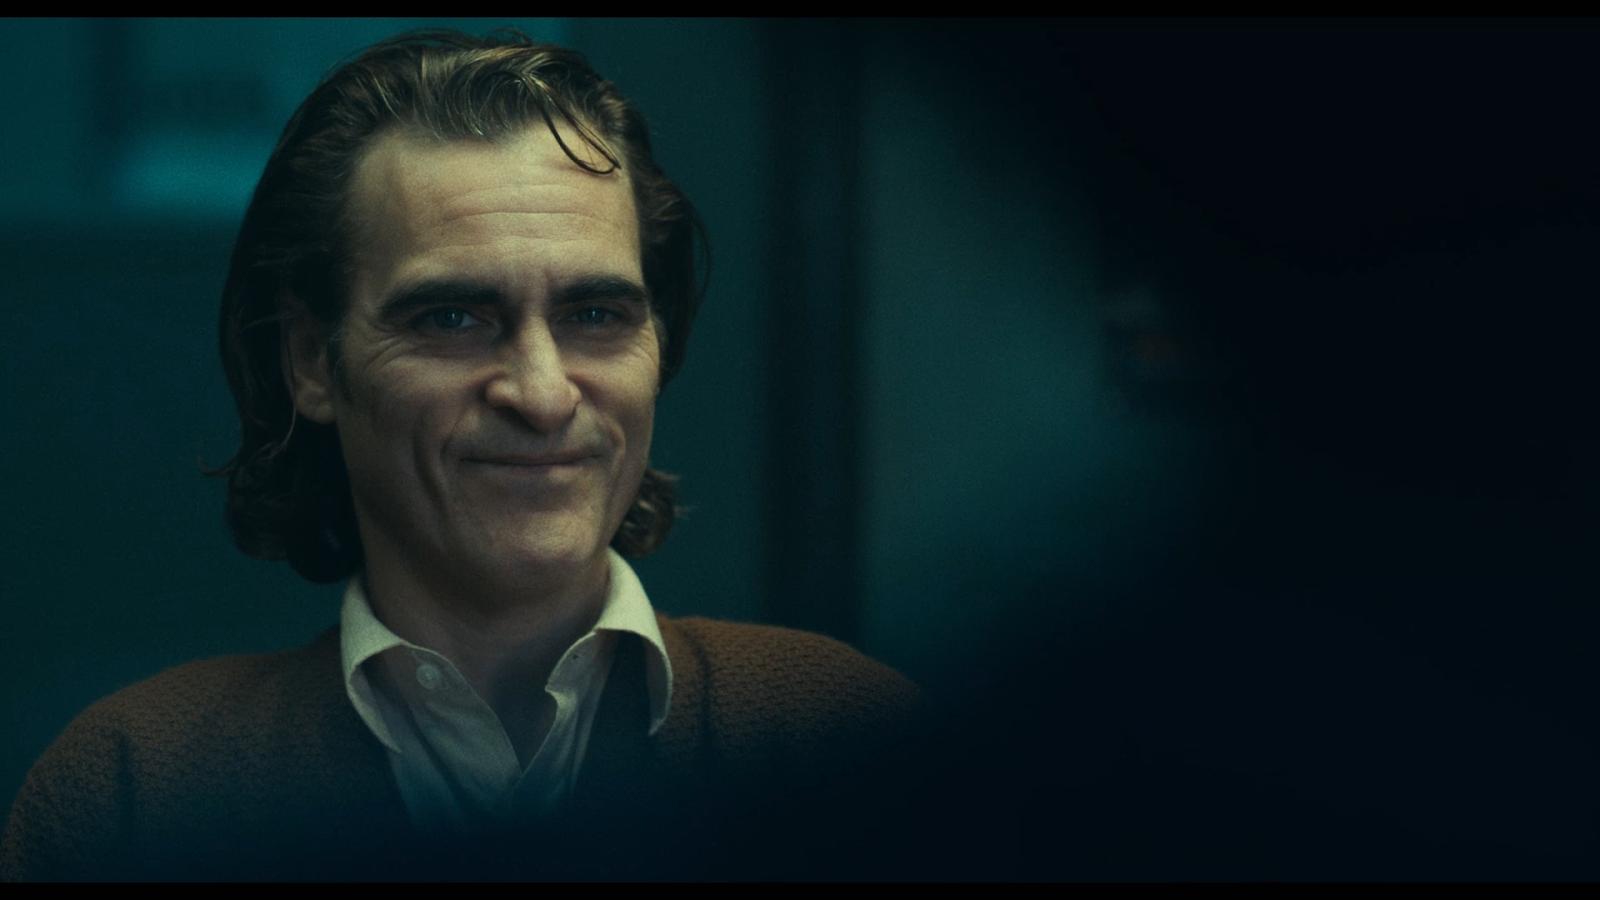 Joker 4K (2019) Ultra HD Blu-ray Review: The Basics